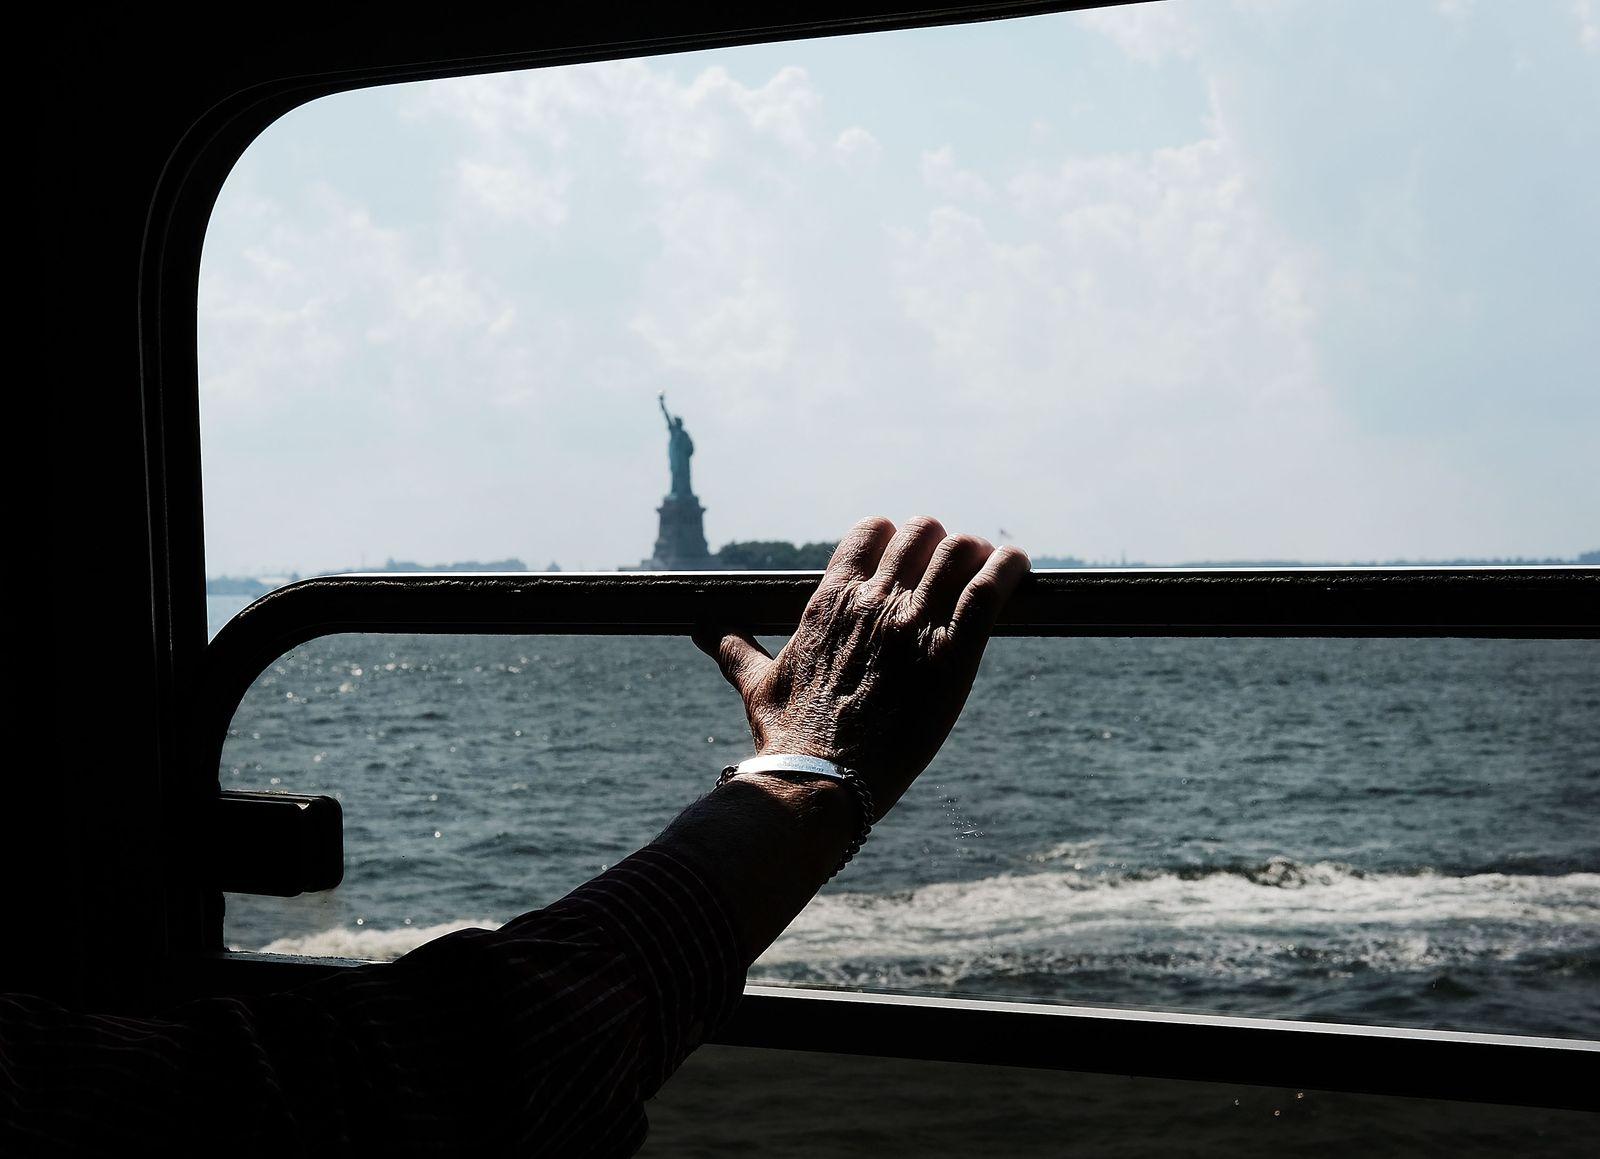 Heat And High Humidity Envelops New York City